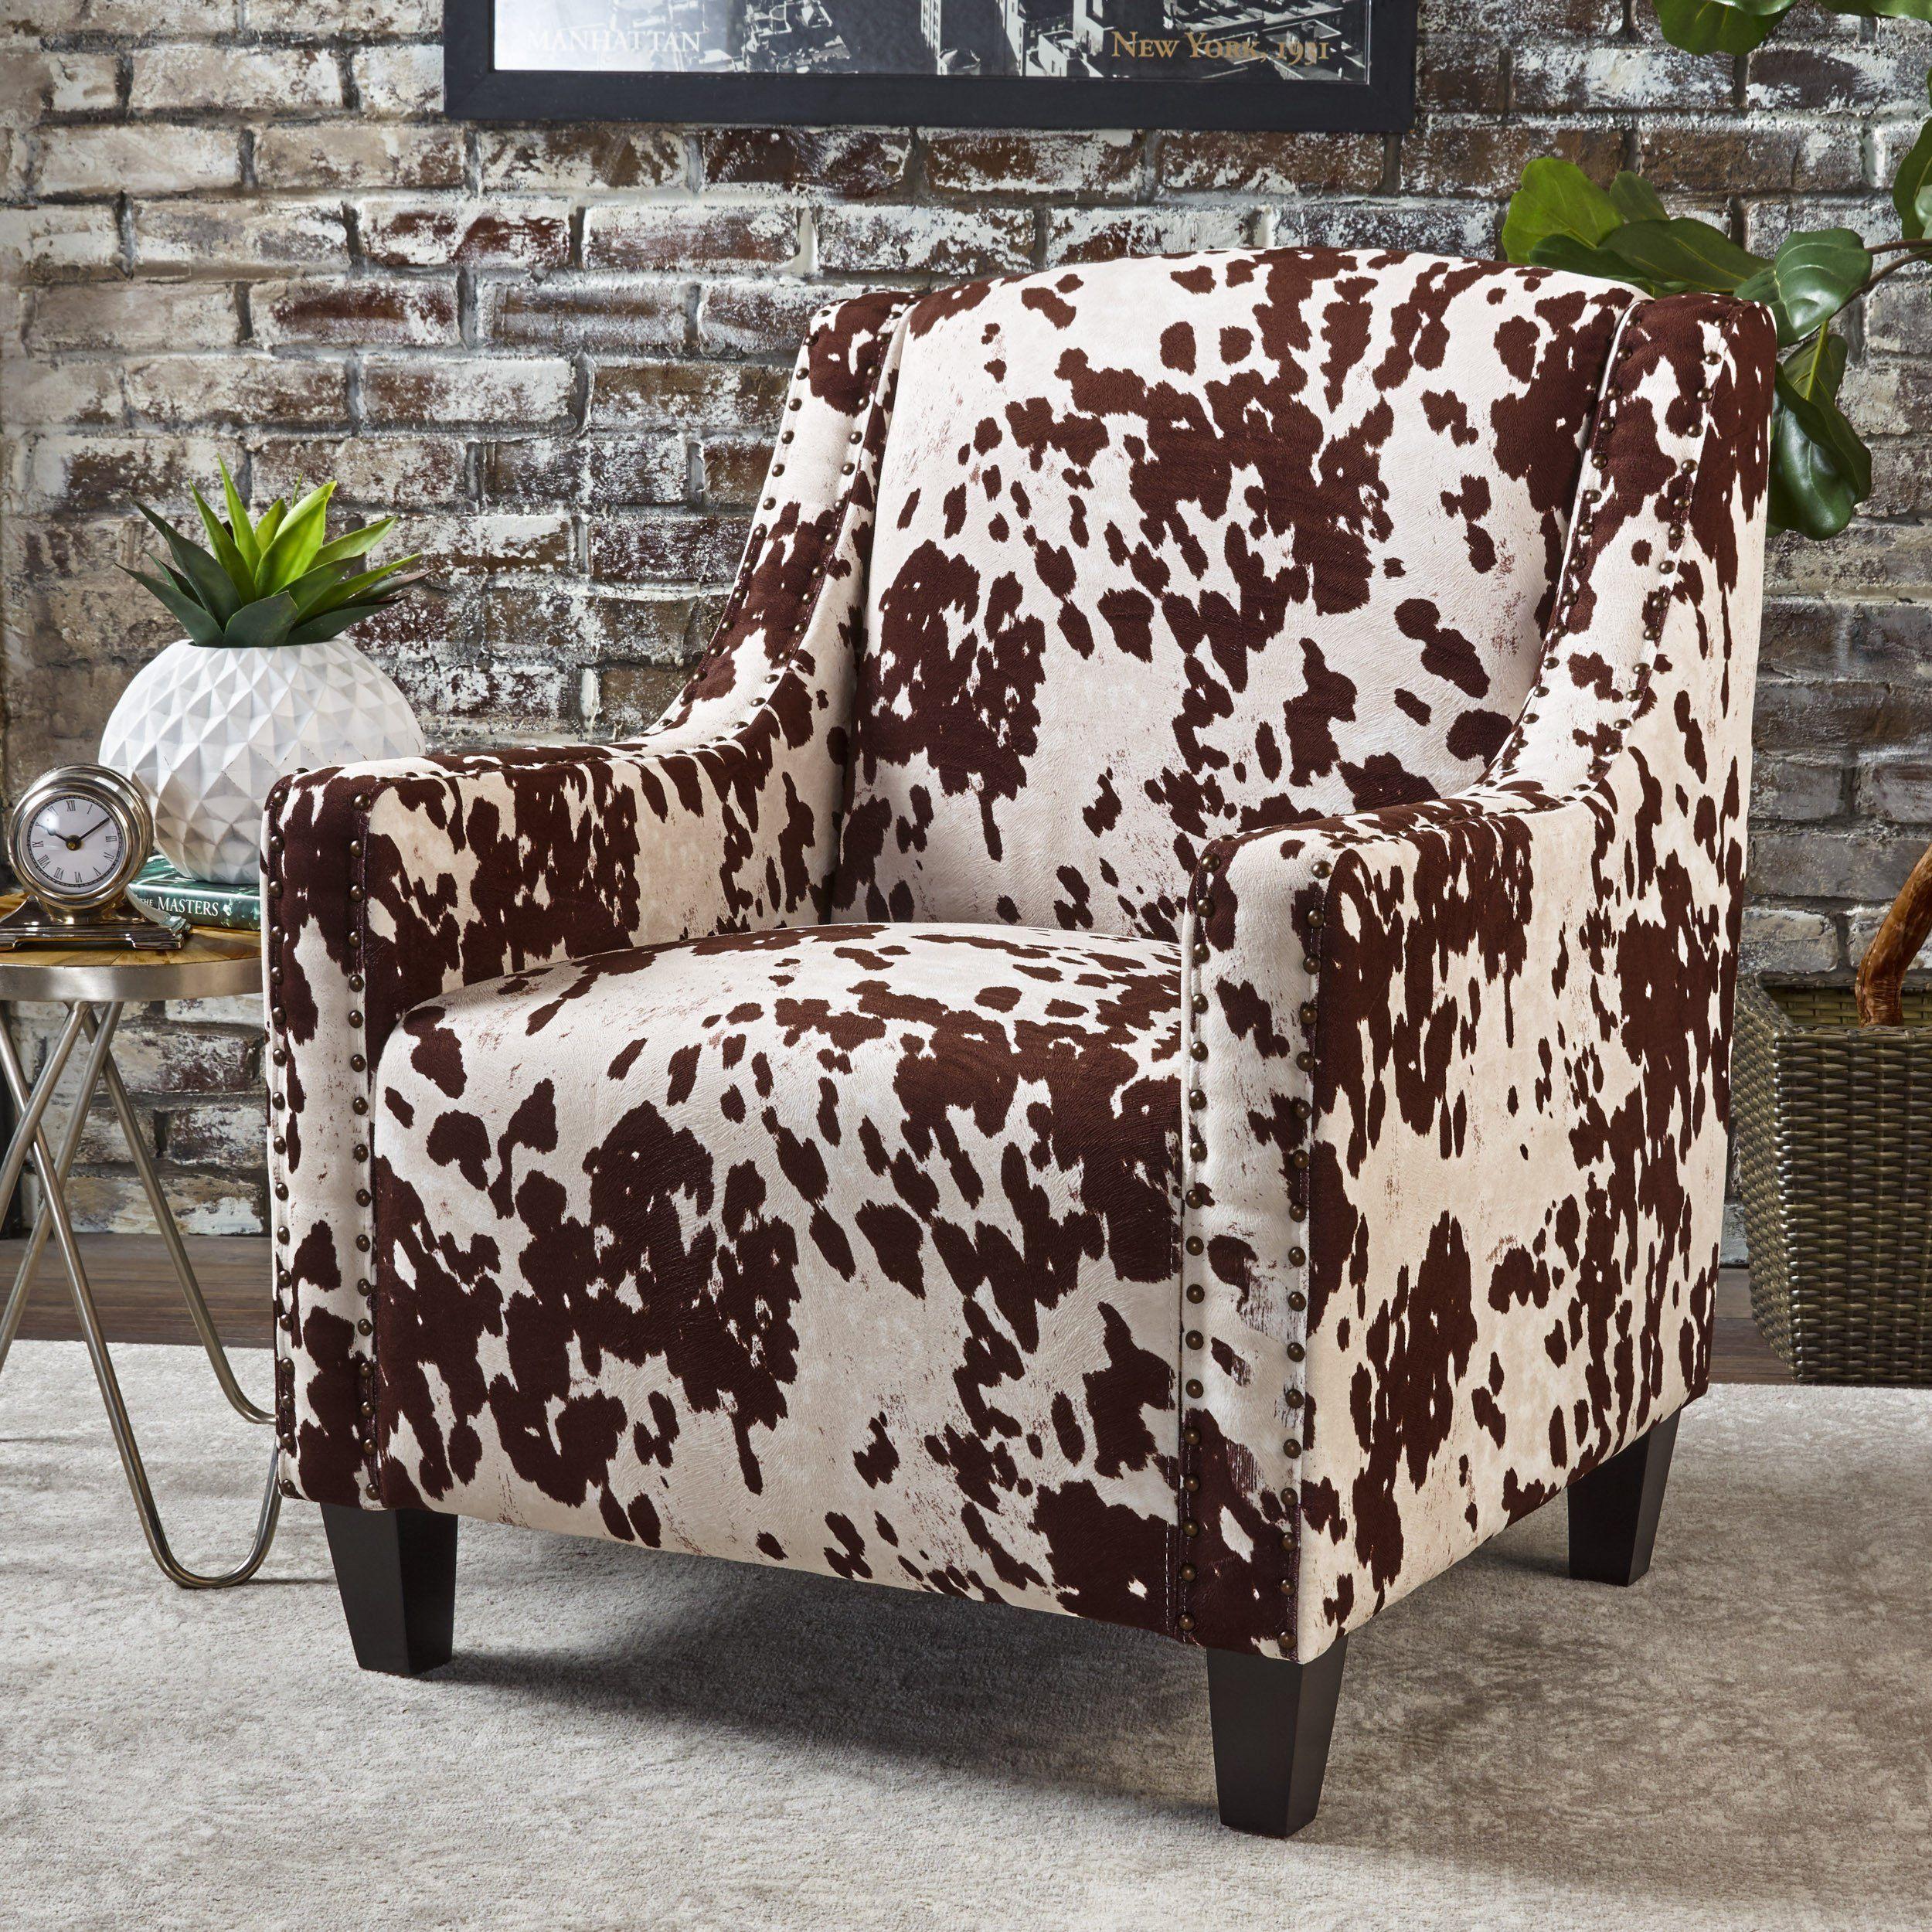 Equestria studded new velvet club chair living room